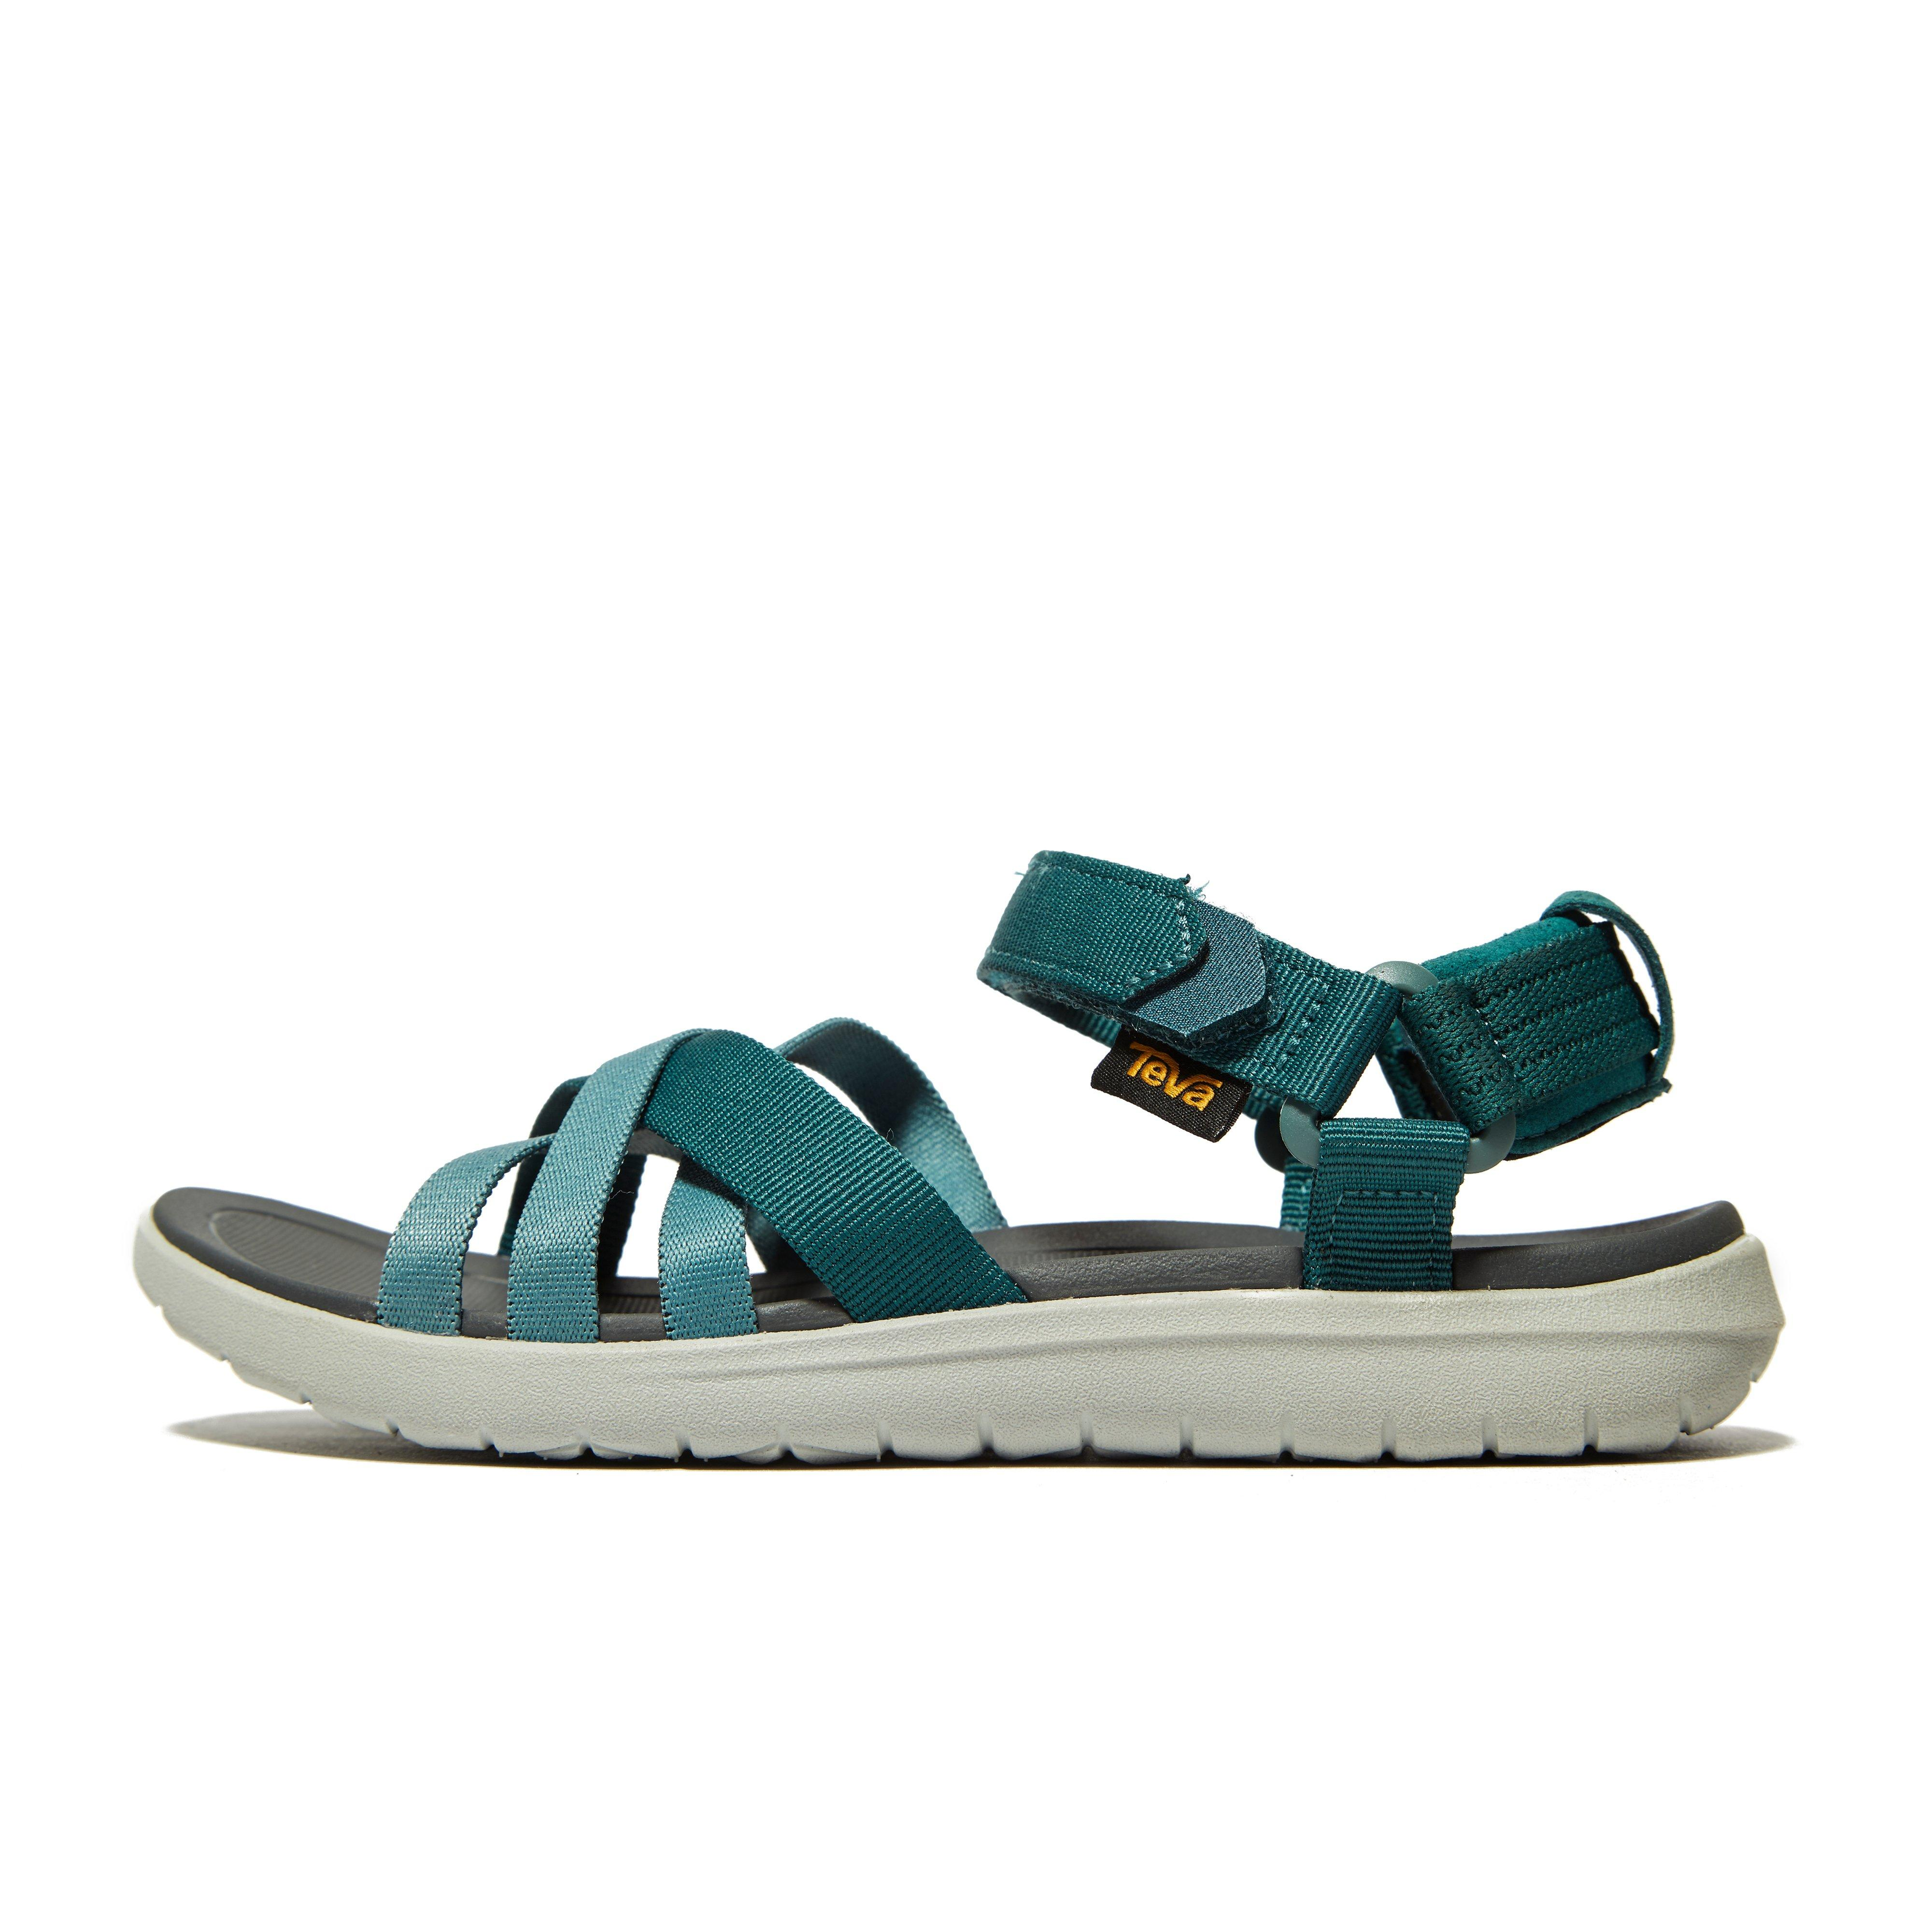 4221ece60616 Details about New Teva Sanborn Women s Walking Outdoor Footwear Sandals Teal